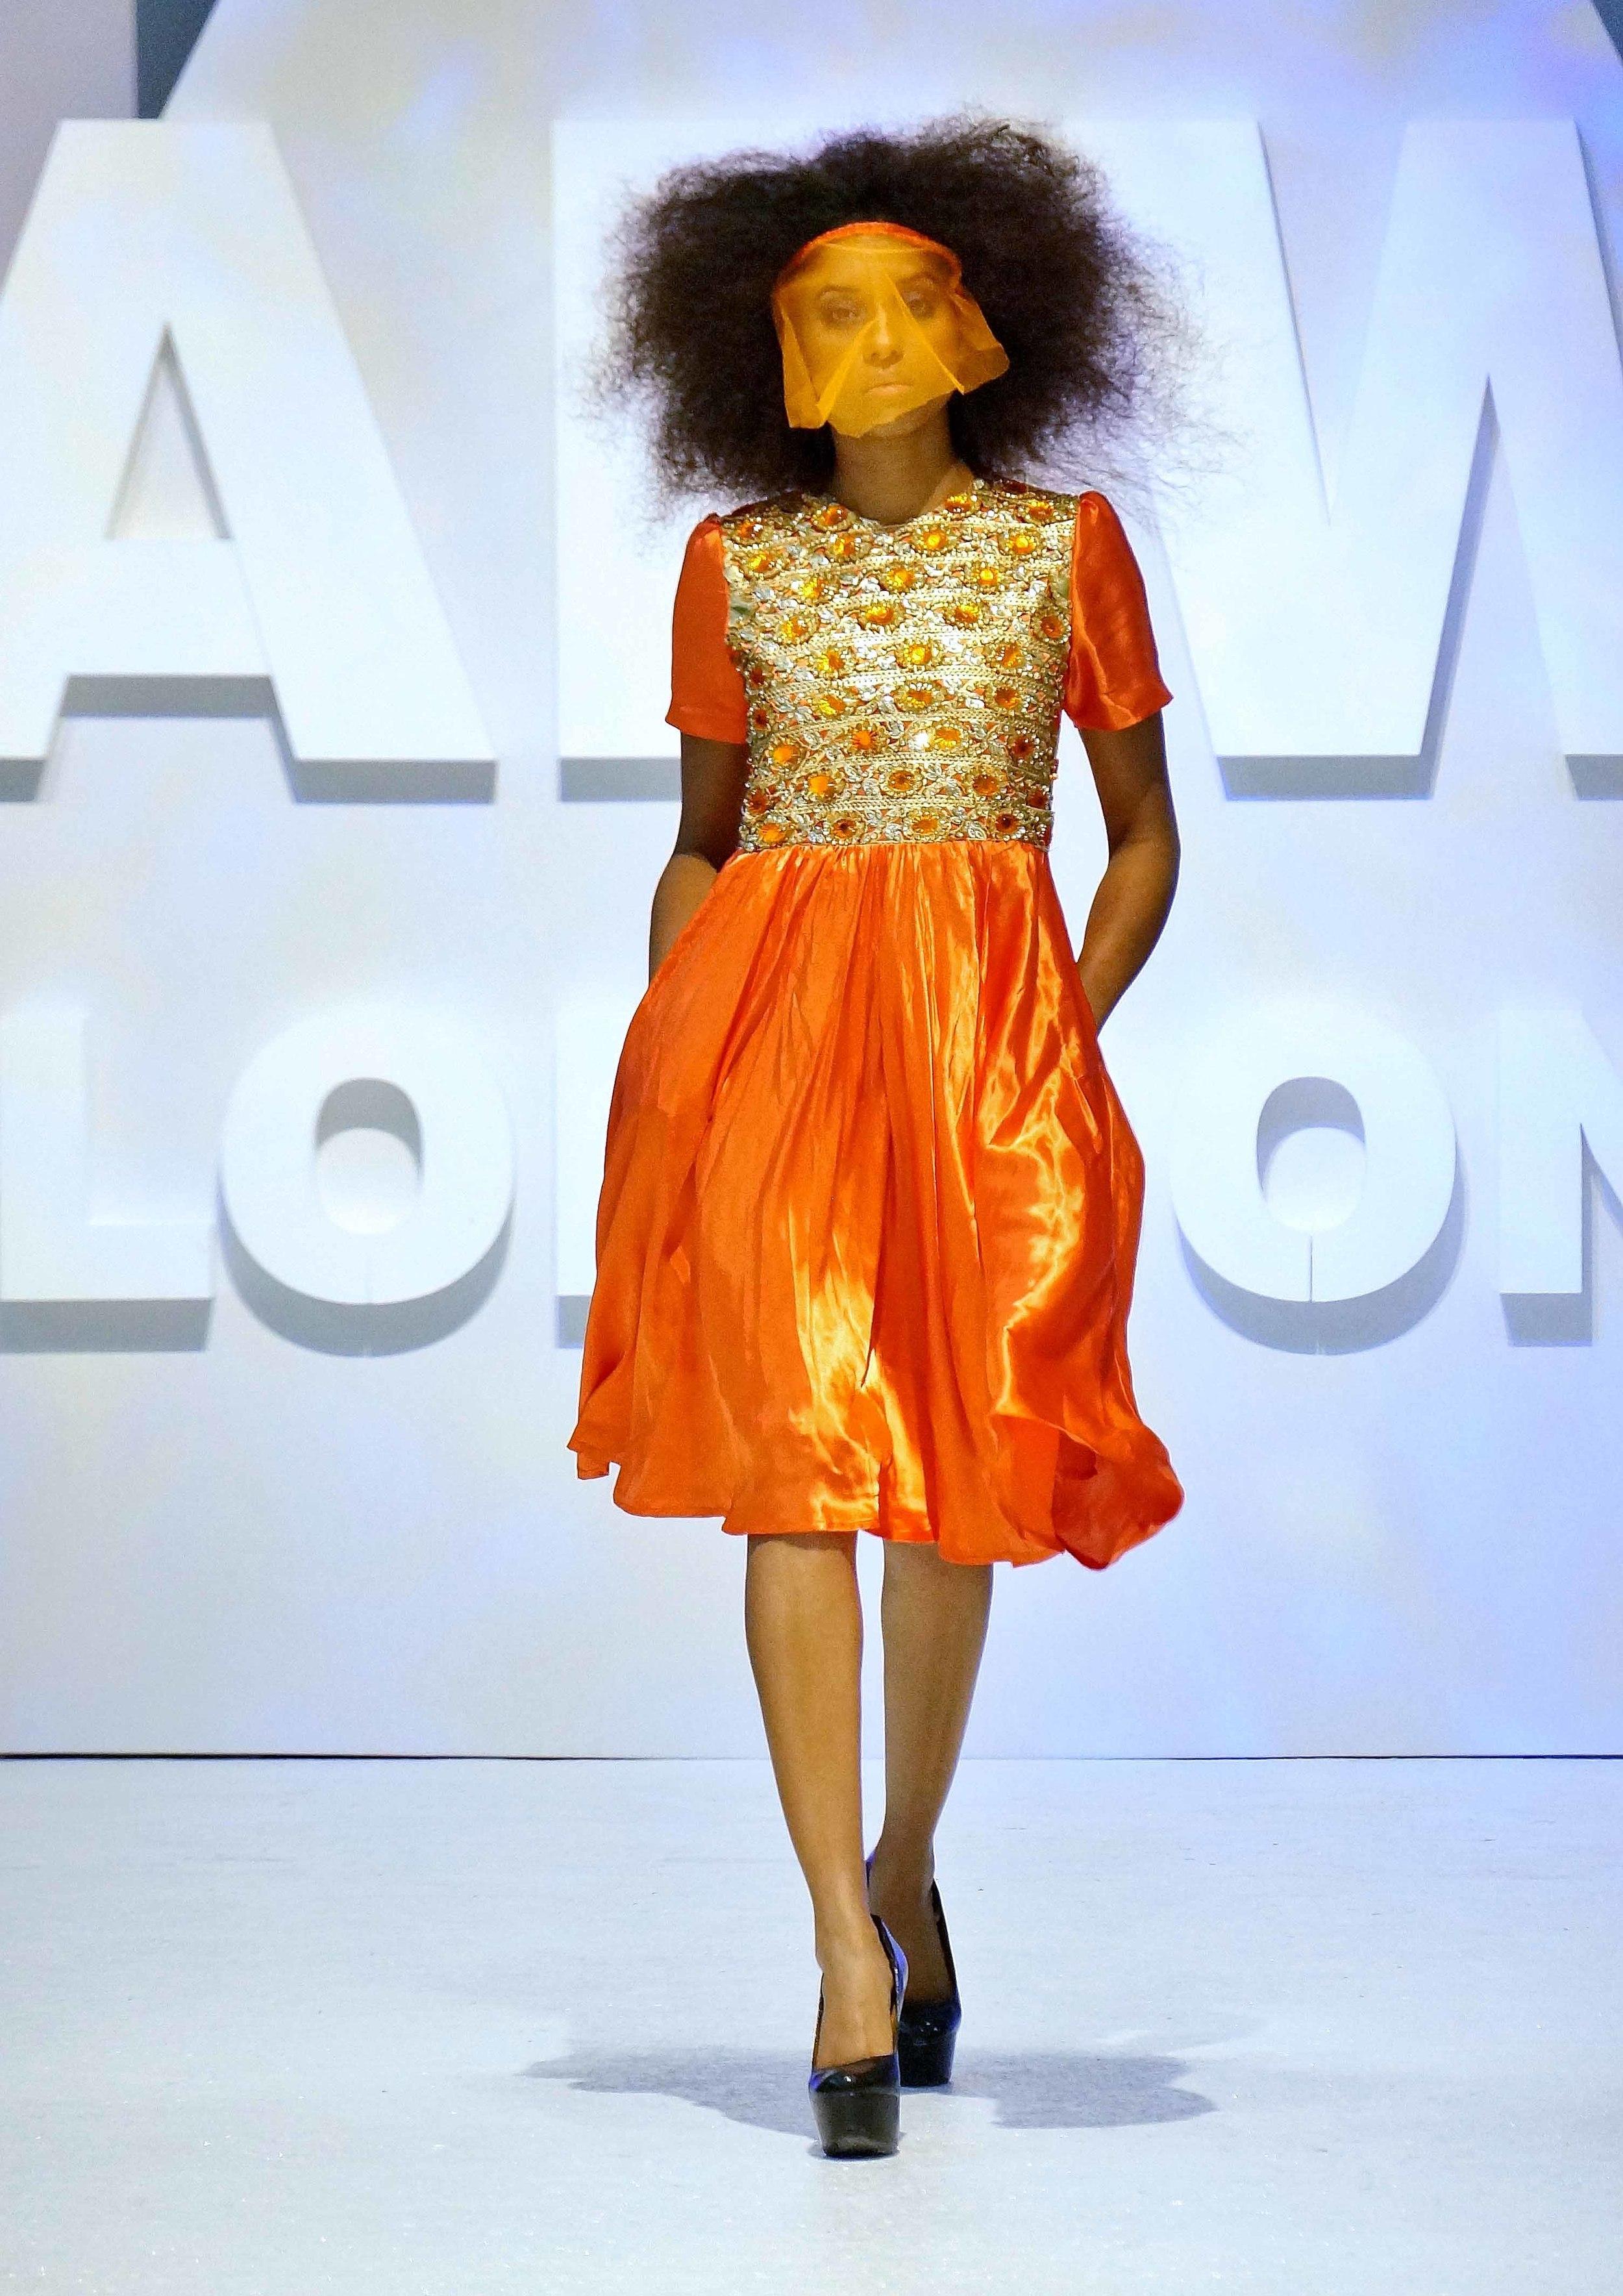 ALABI COUTURE / PHOTOGRAPHY: Karlton Chambers